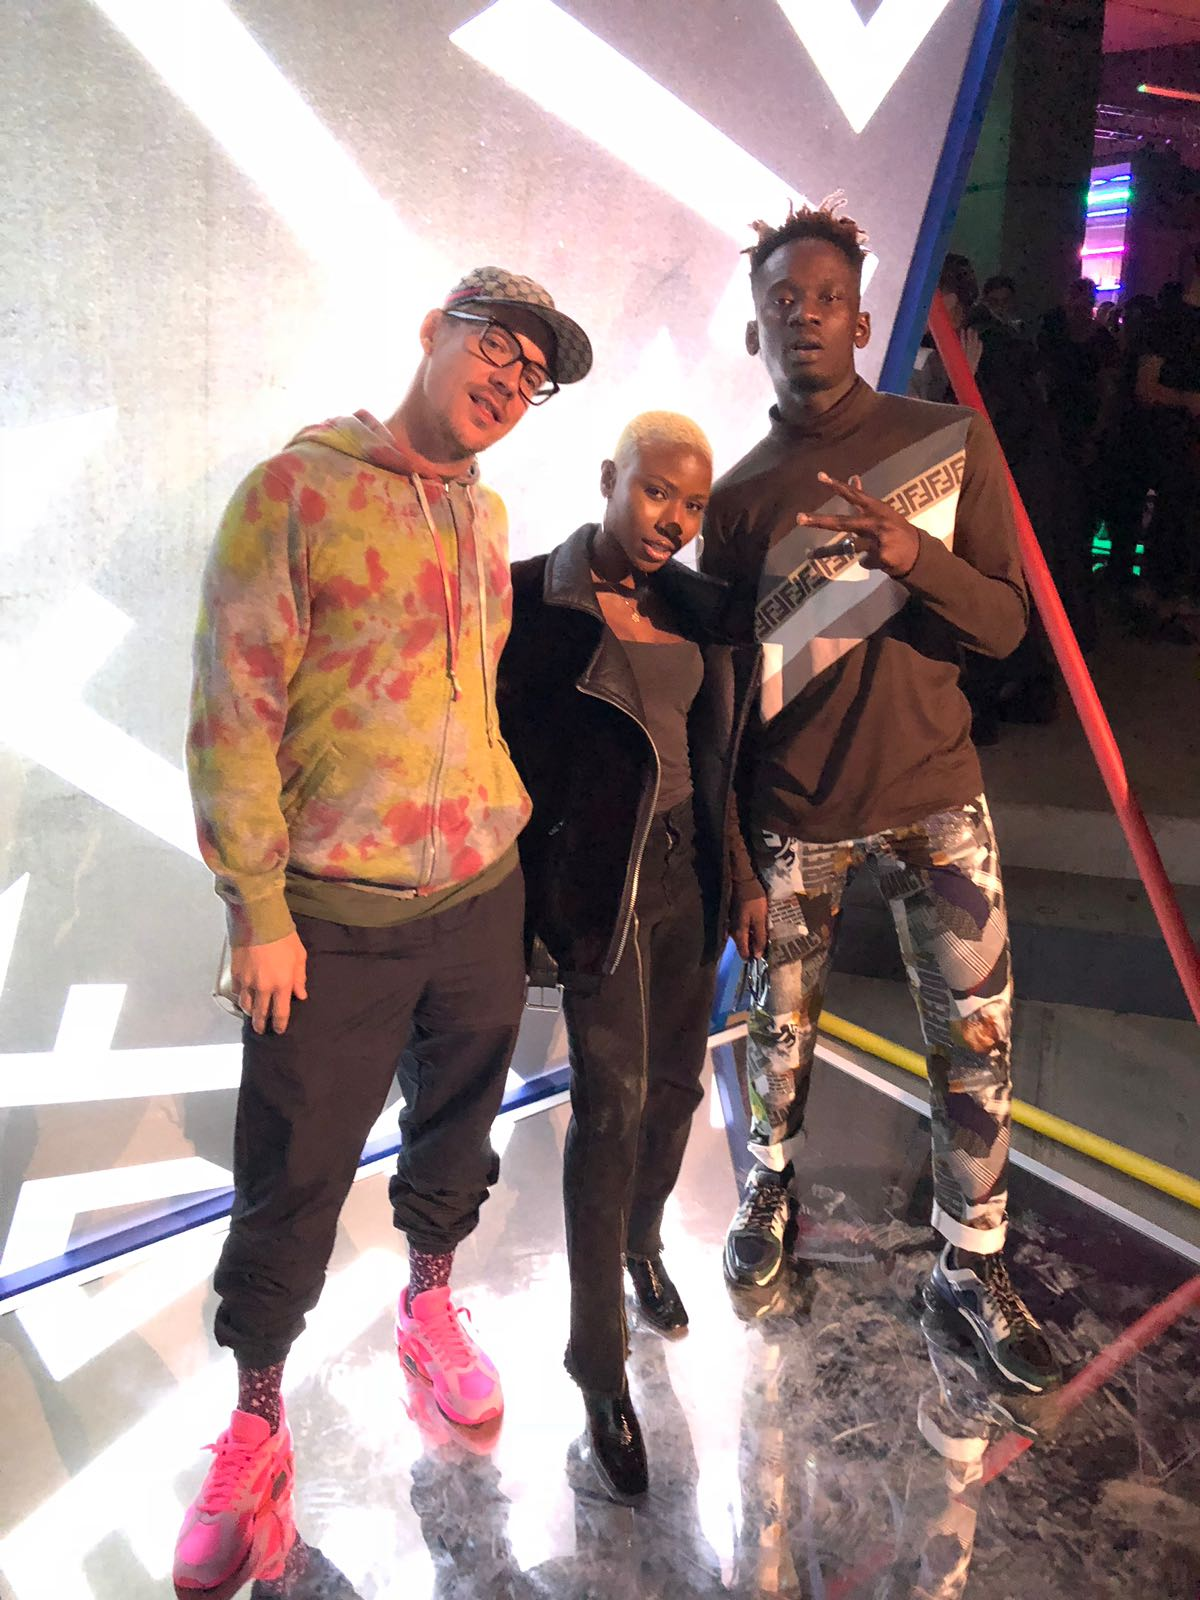 Fendi Gang! Mr Eazi parties with Big Sean, Jhene Aiko & Diplo in London